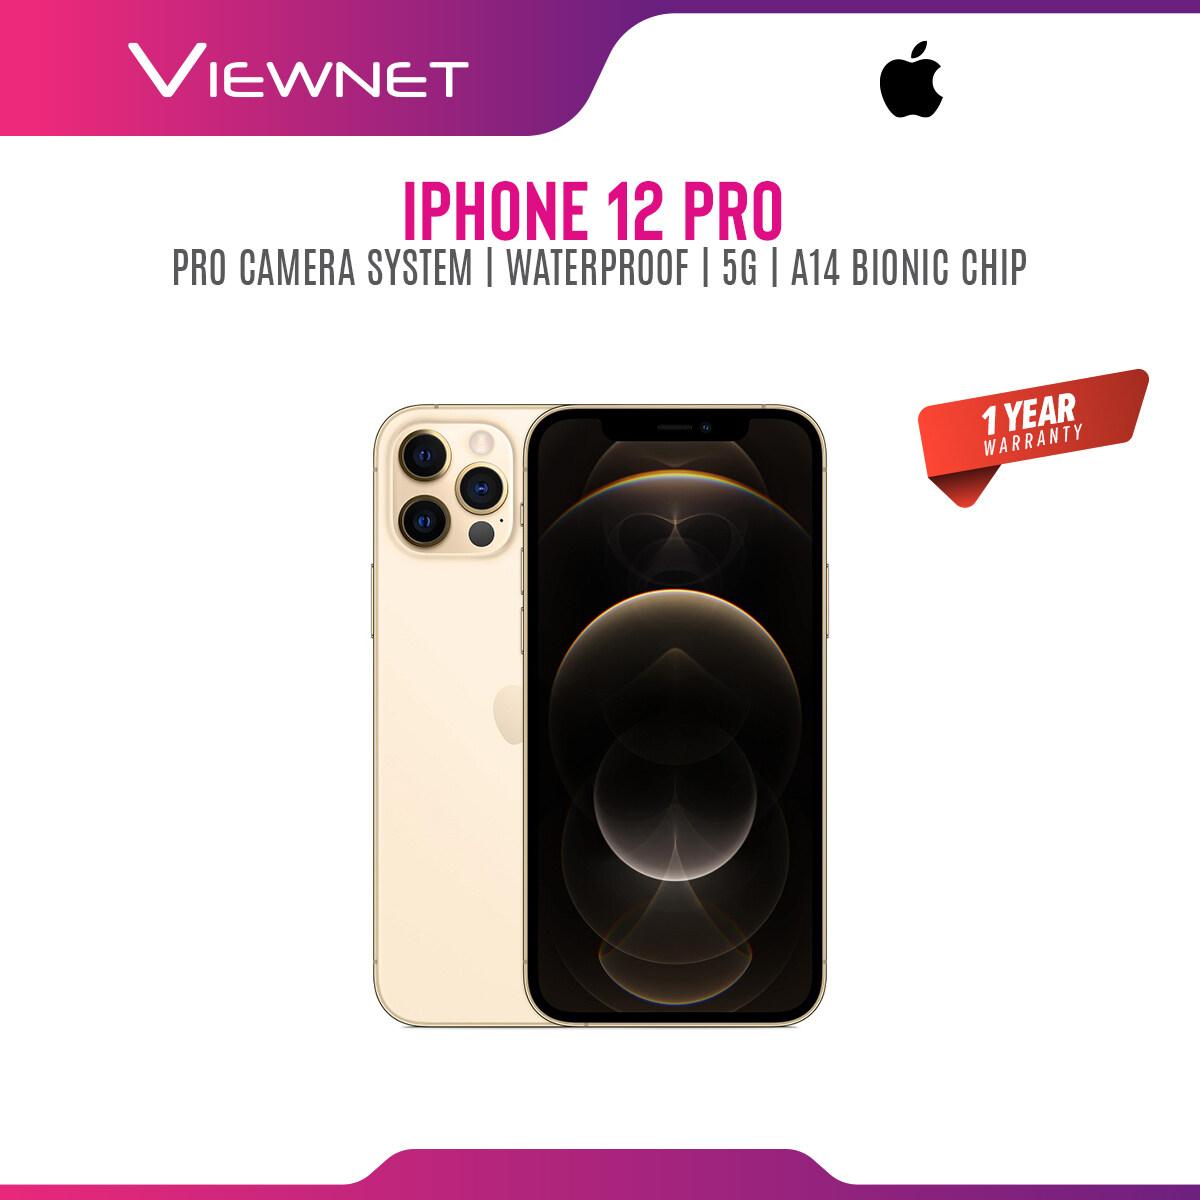 Apple iPhone 12 Pro (128GB,256GB,512GB) 5G smartphone,1 year warranty